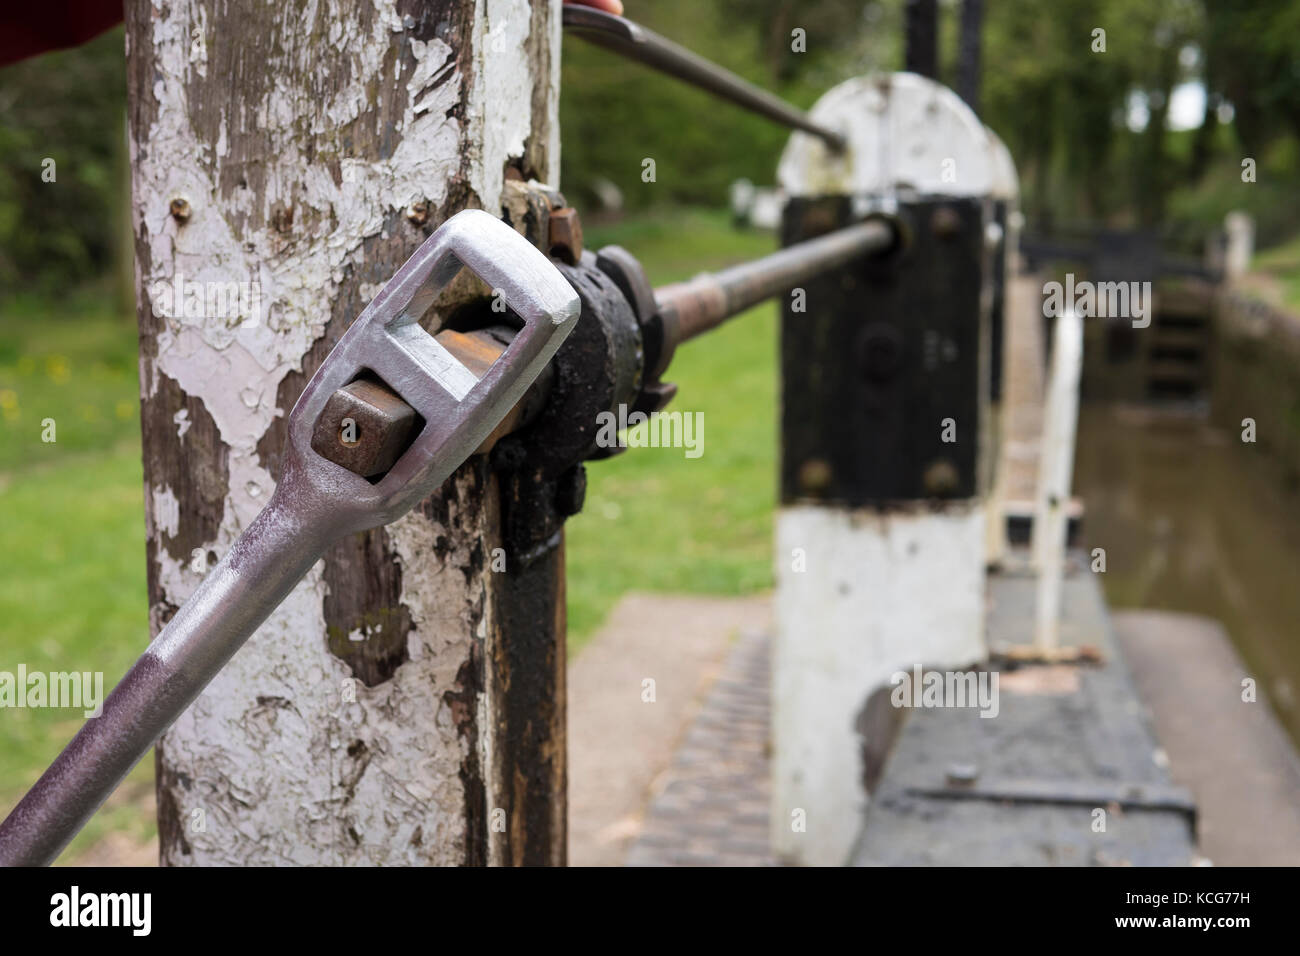 Lock key handle windlass canal boating Oxford Canal Oxfordshire England - Stock Image